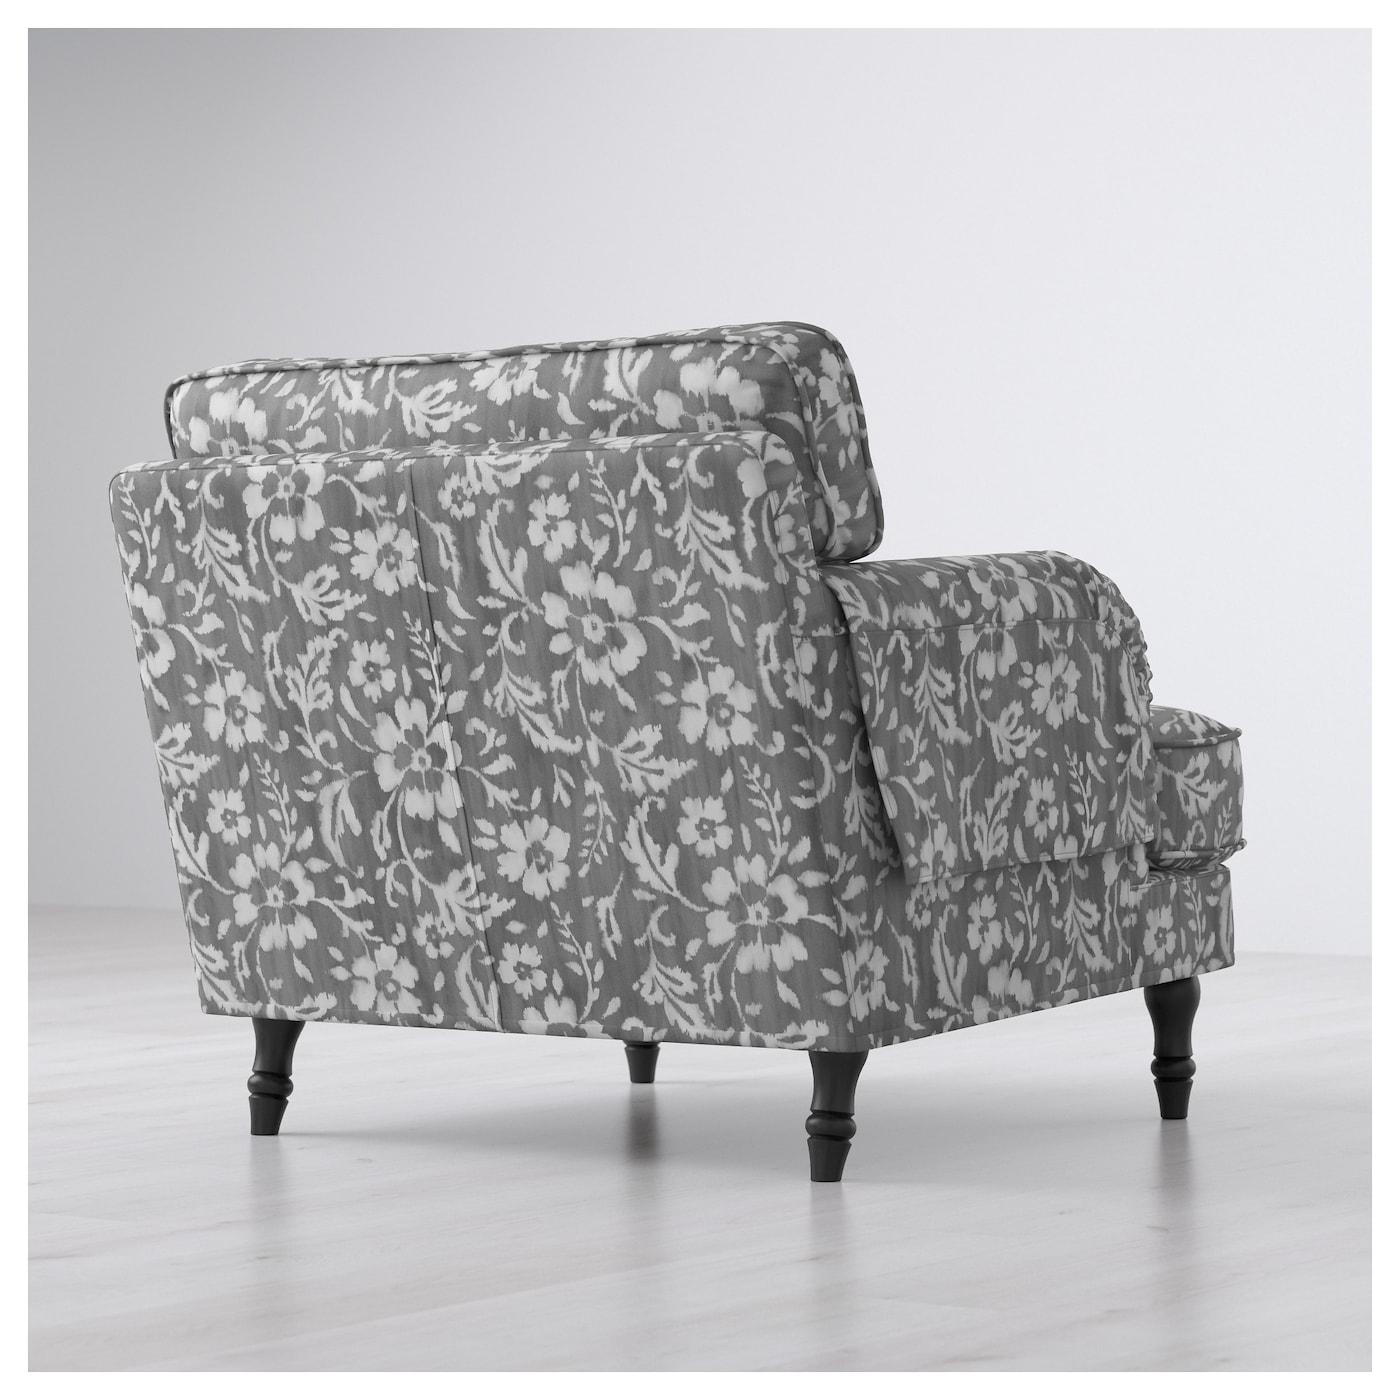 Stocksund fauteuil hovsten gris blanc noir bois ikea - Fauteuil blanc ikea ...